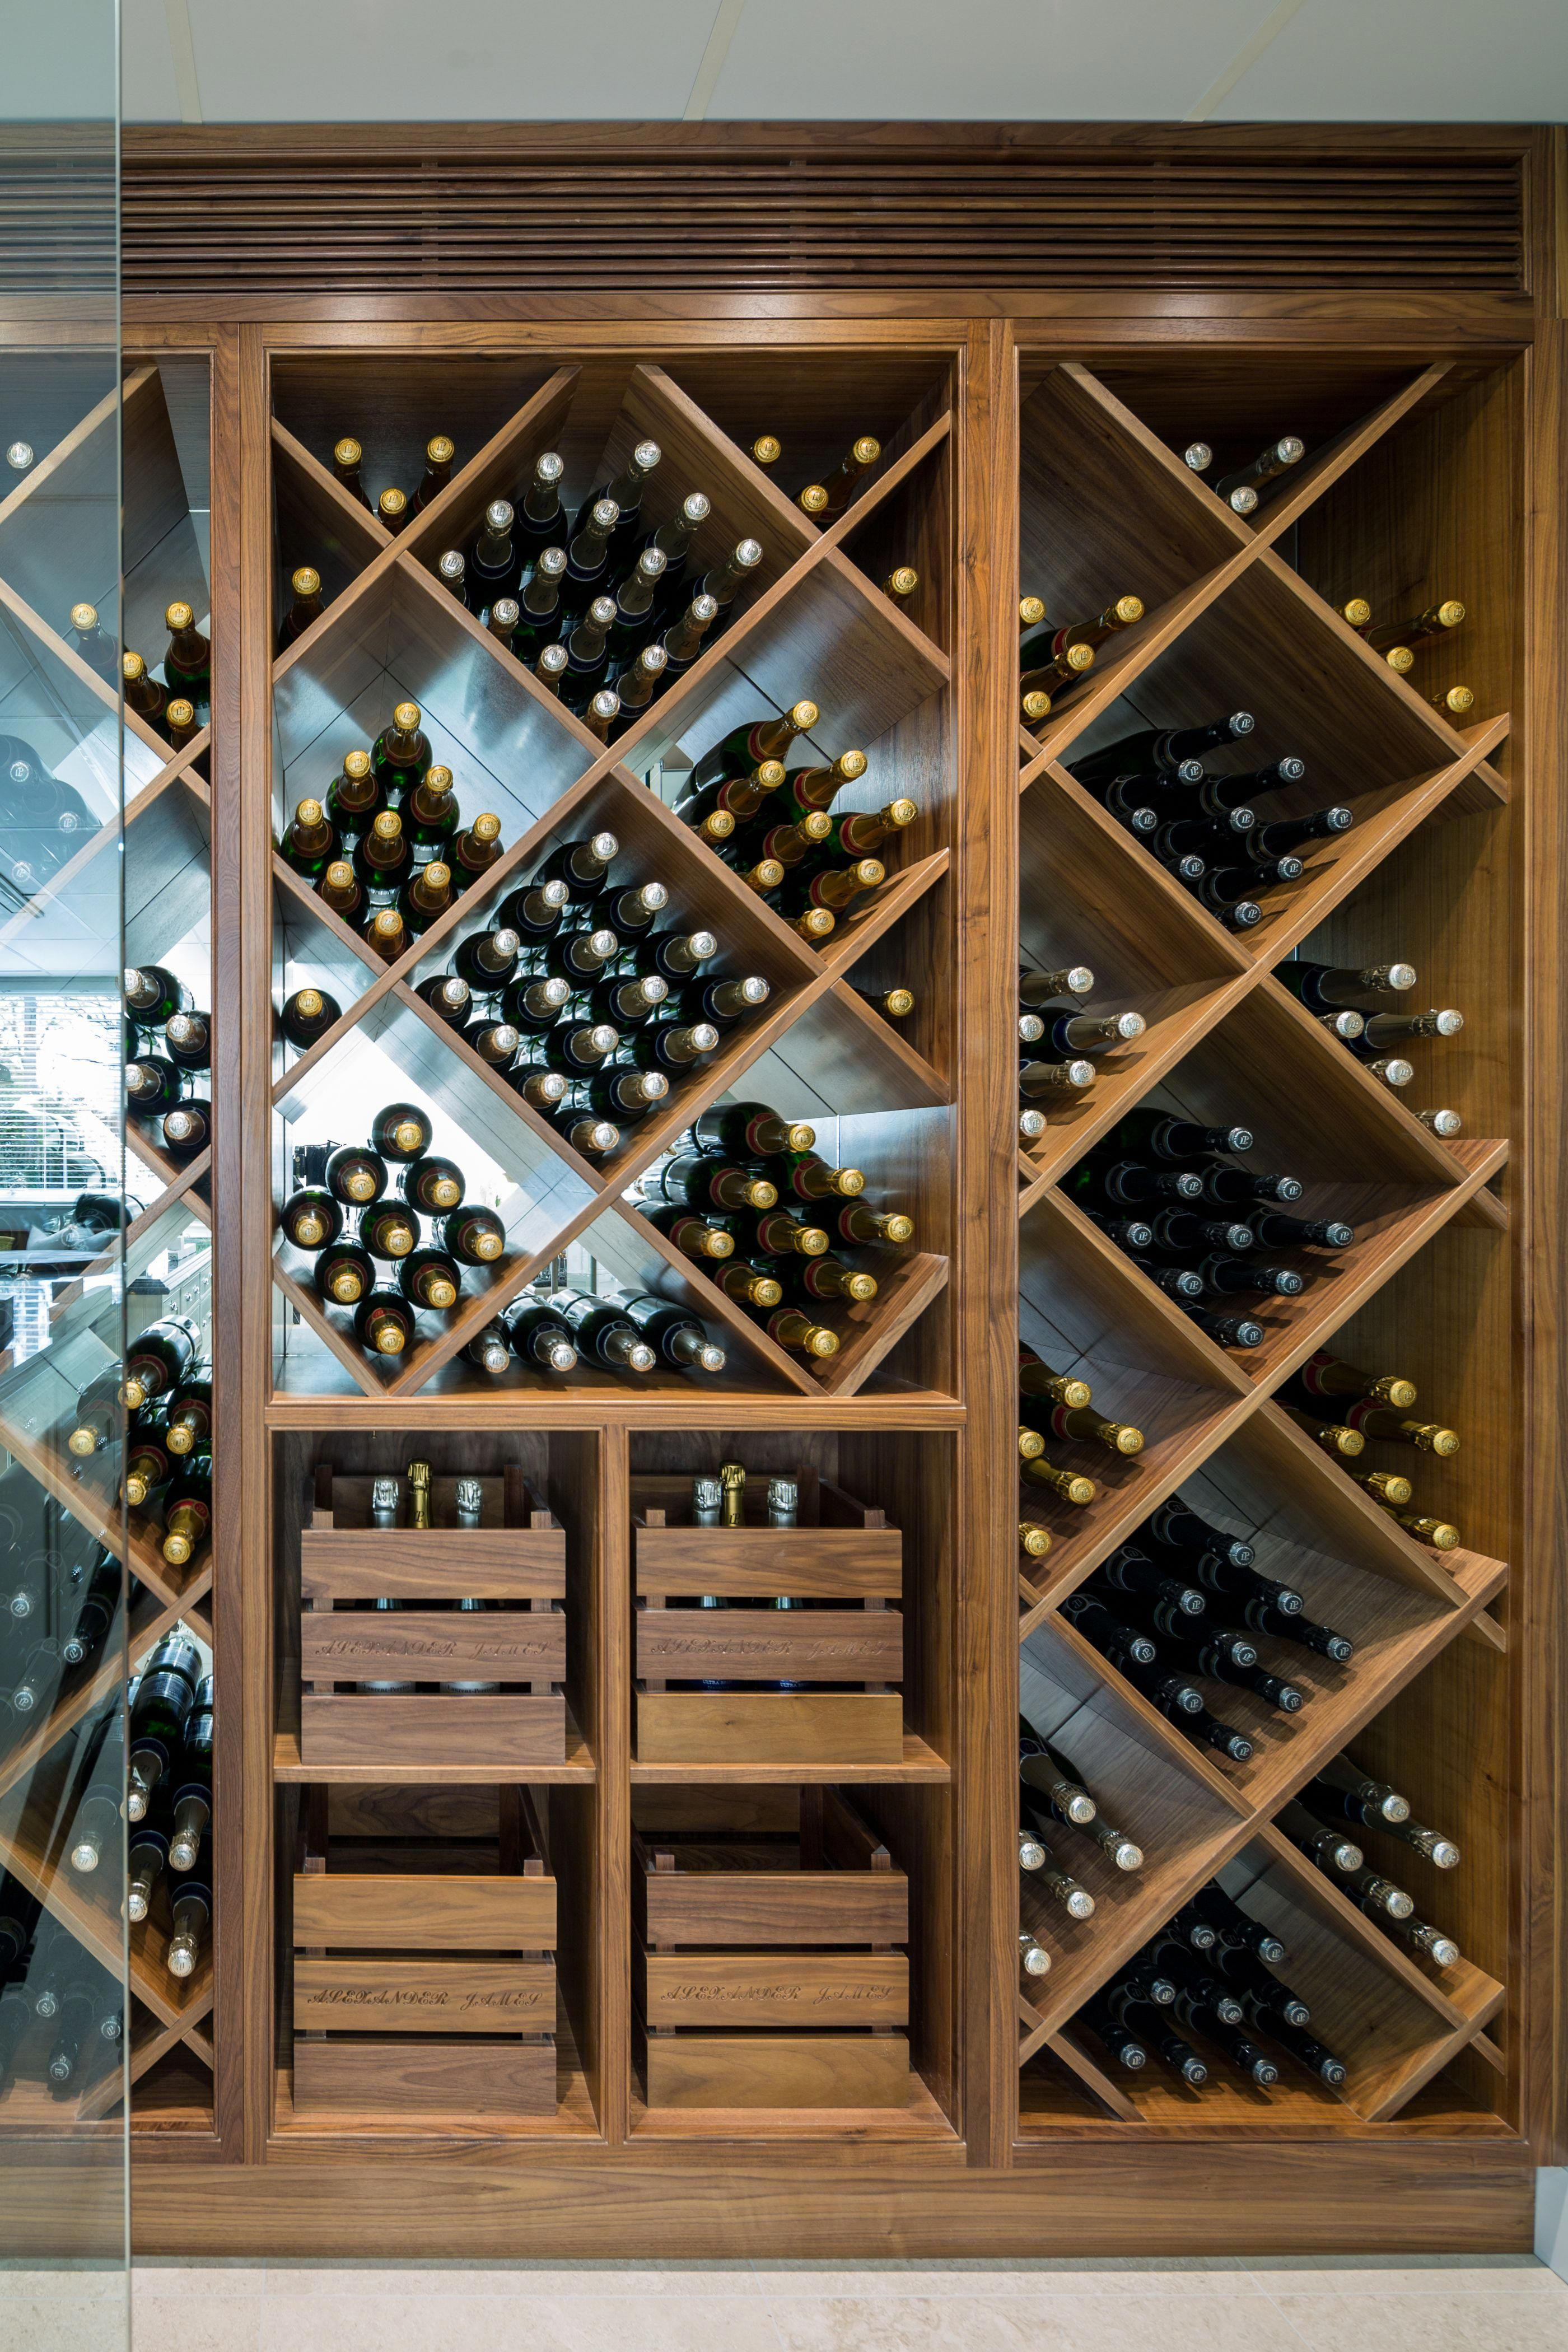 Chardonnay Boxed Wine Bar Ideas Wine Tasting South Of France Cognac Coffee Wine Cellar Design Cellar Design Home Wine Cellars